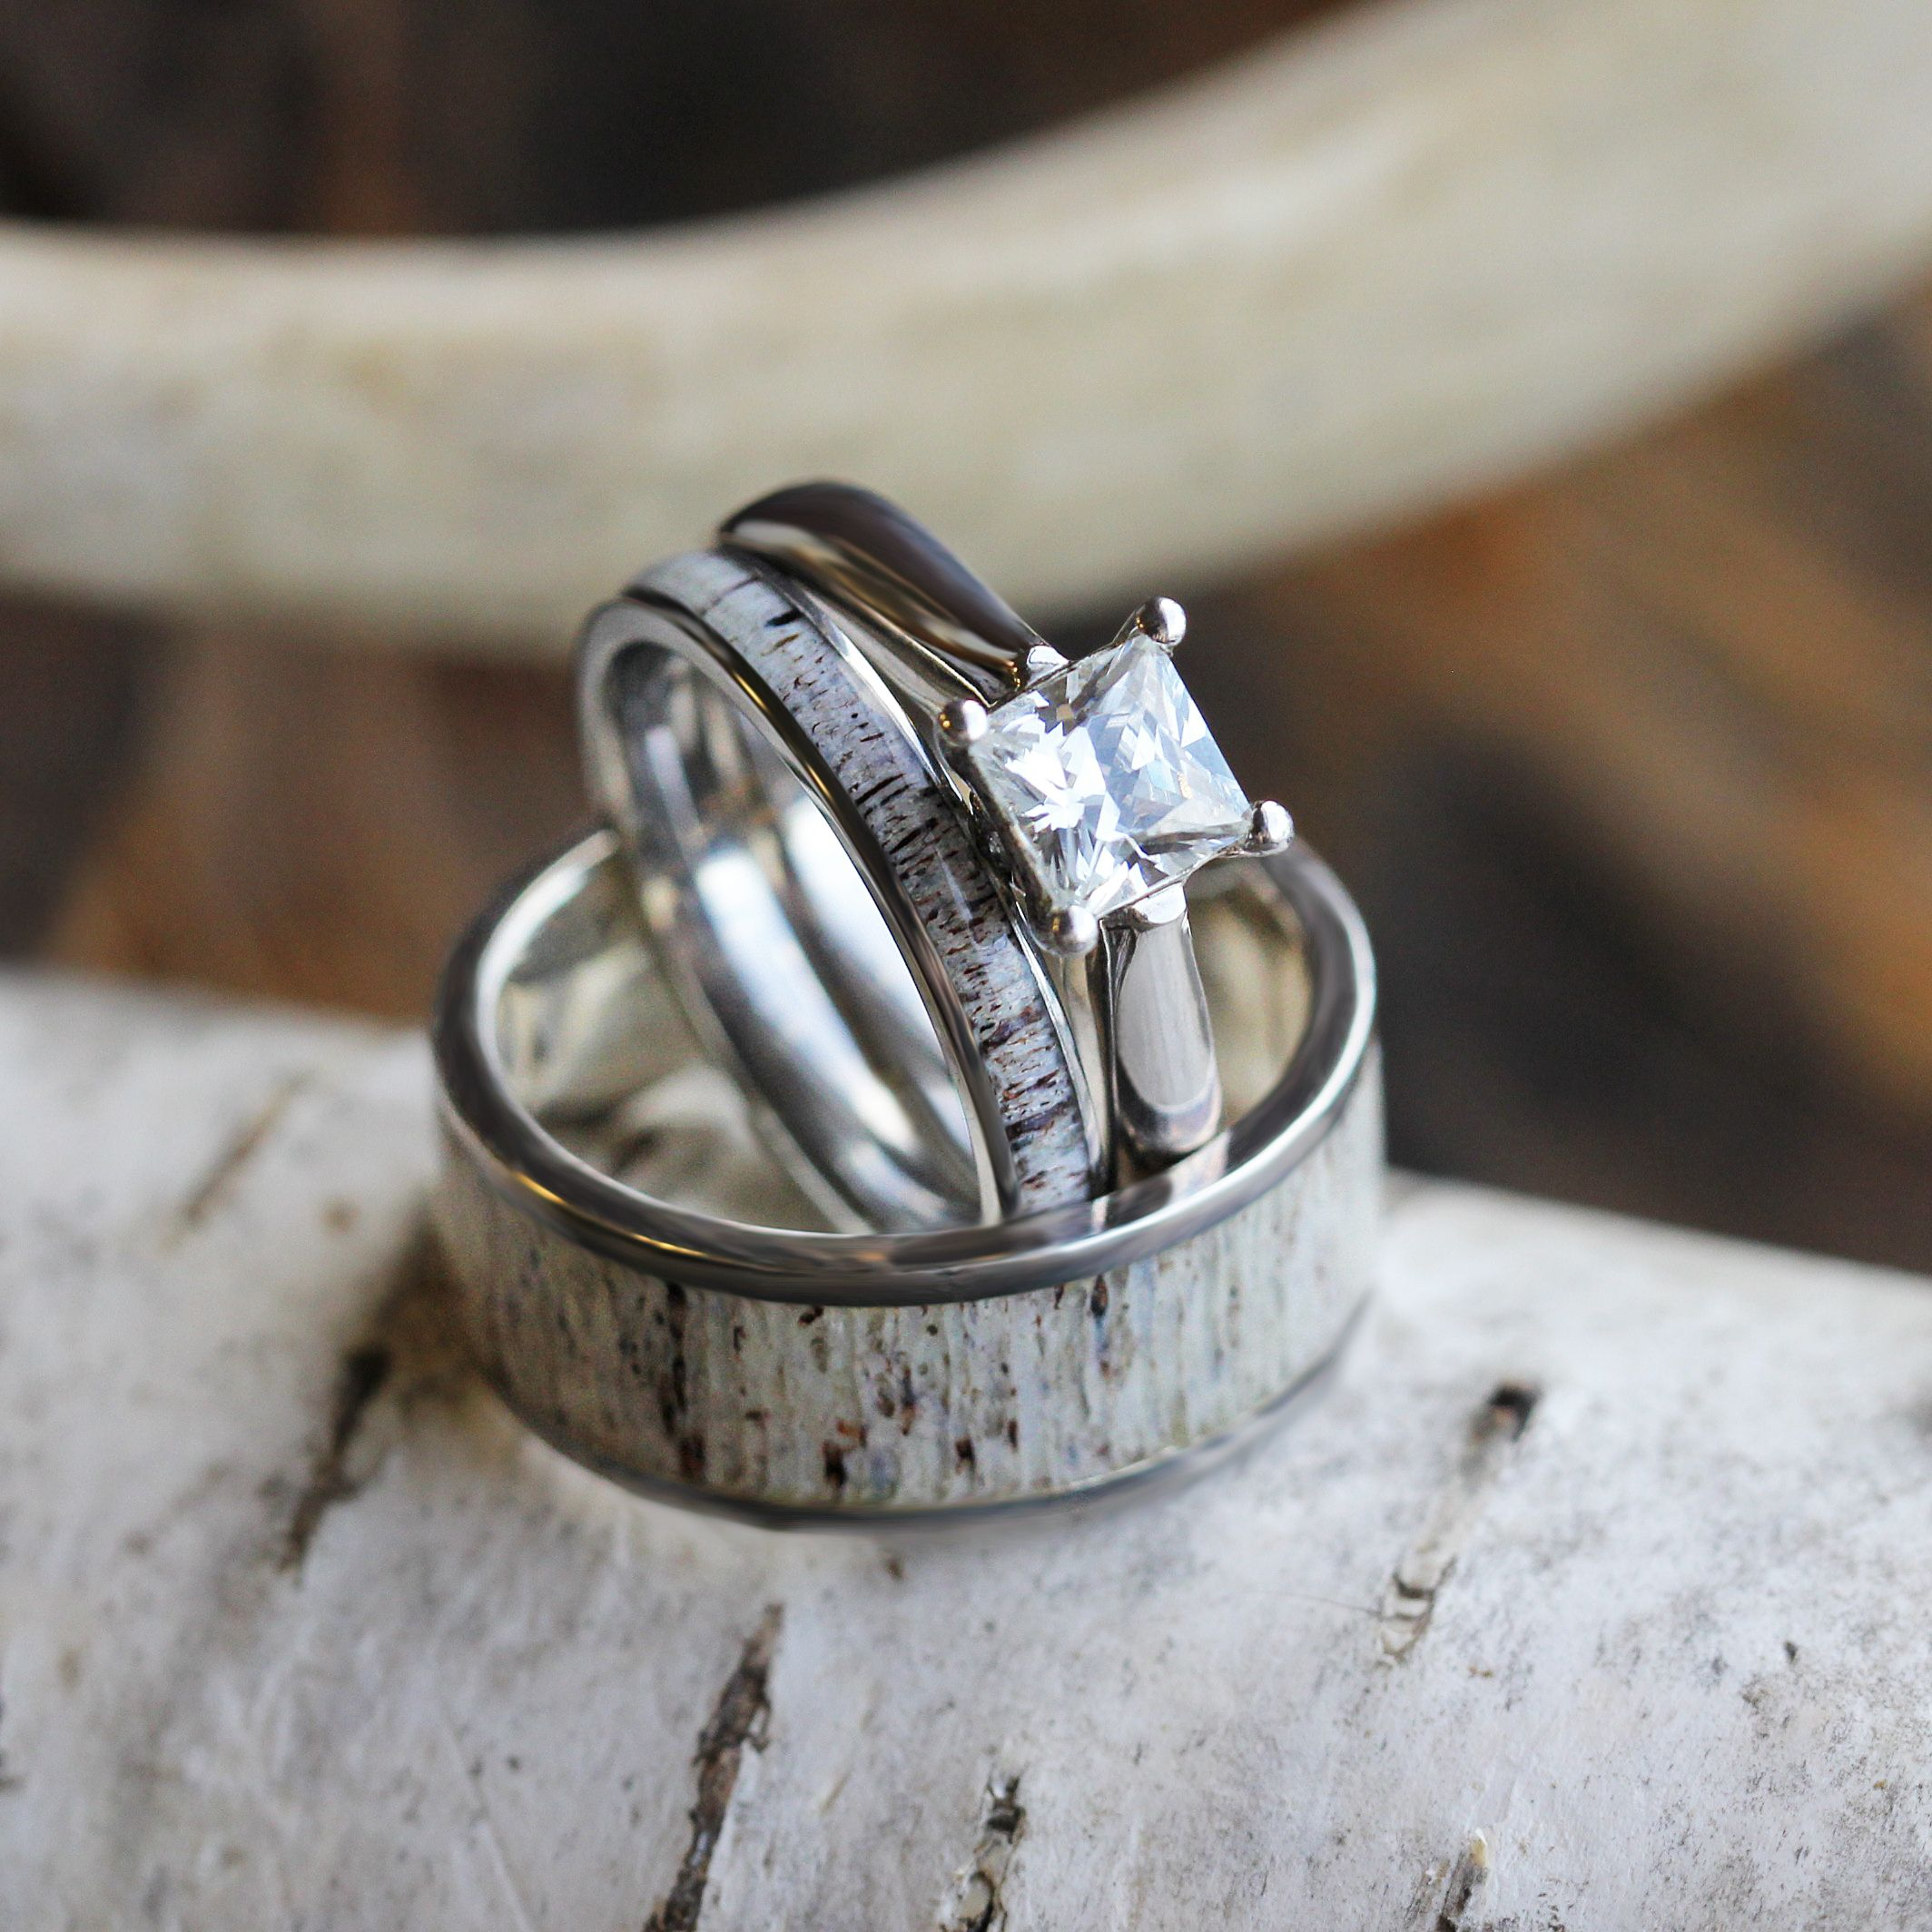 Deer Antler Wedding Ring Set, His And Hers Matching